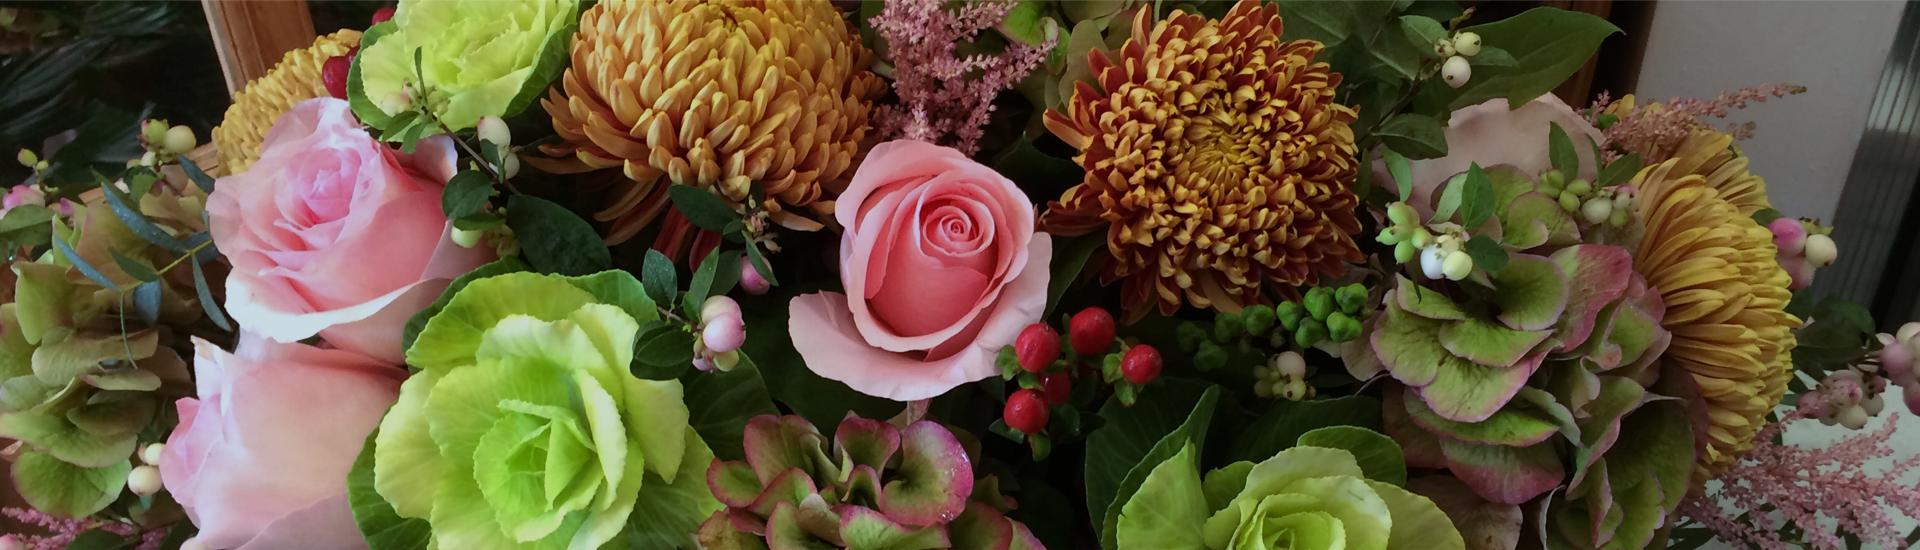 Flower Shop Wedding Florists Event Floral Tryforos Pernice